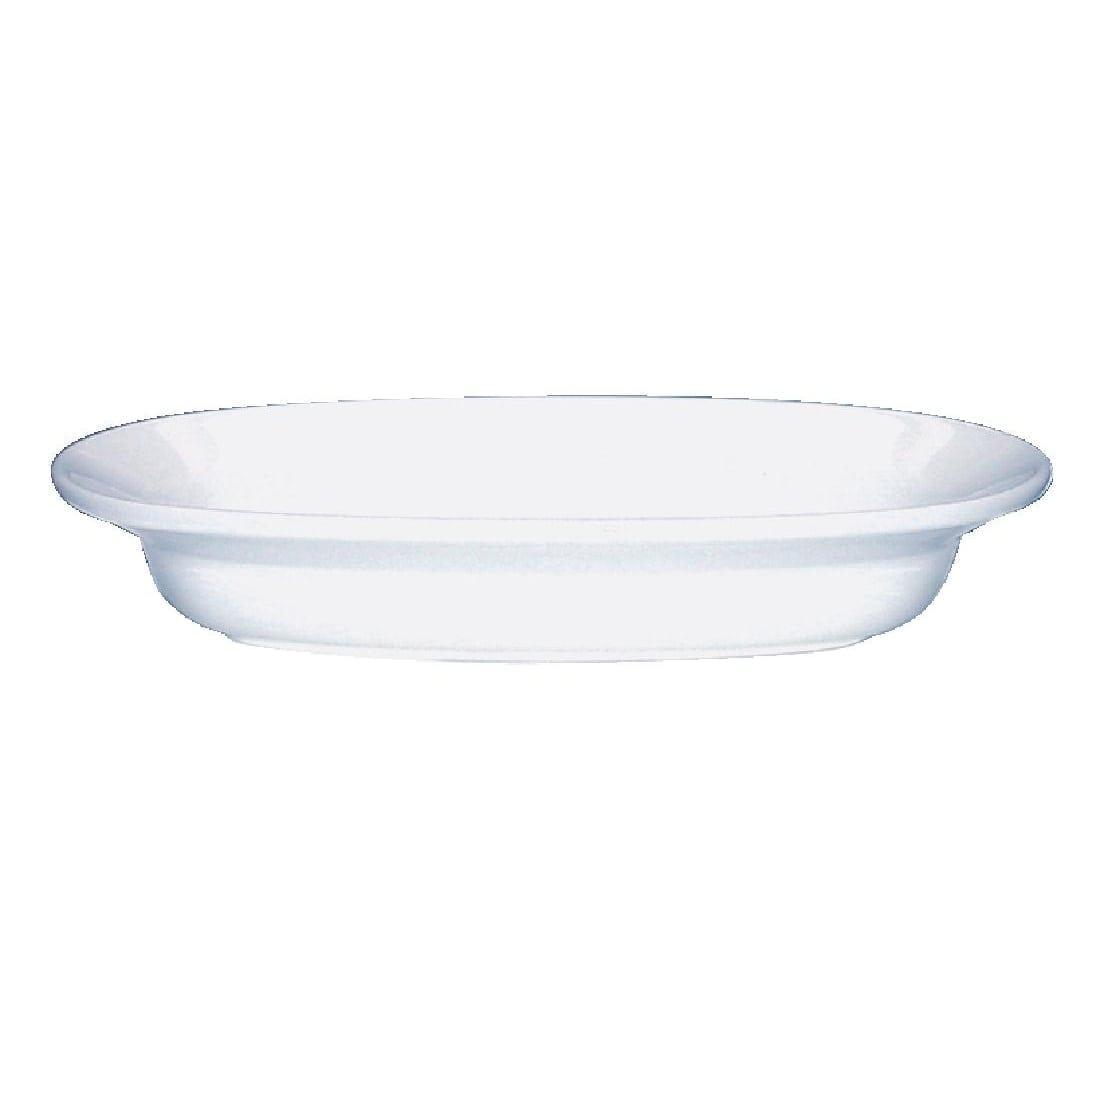 "Alchemy White Oval Bowl - 9"" (Box 12) (Direct)-0"